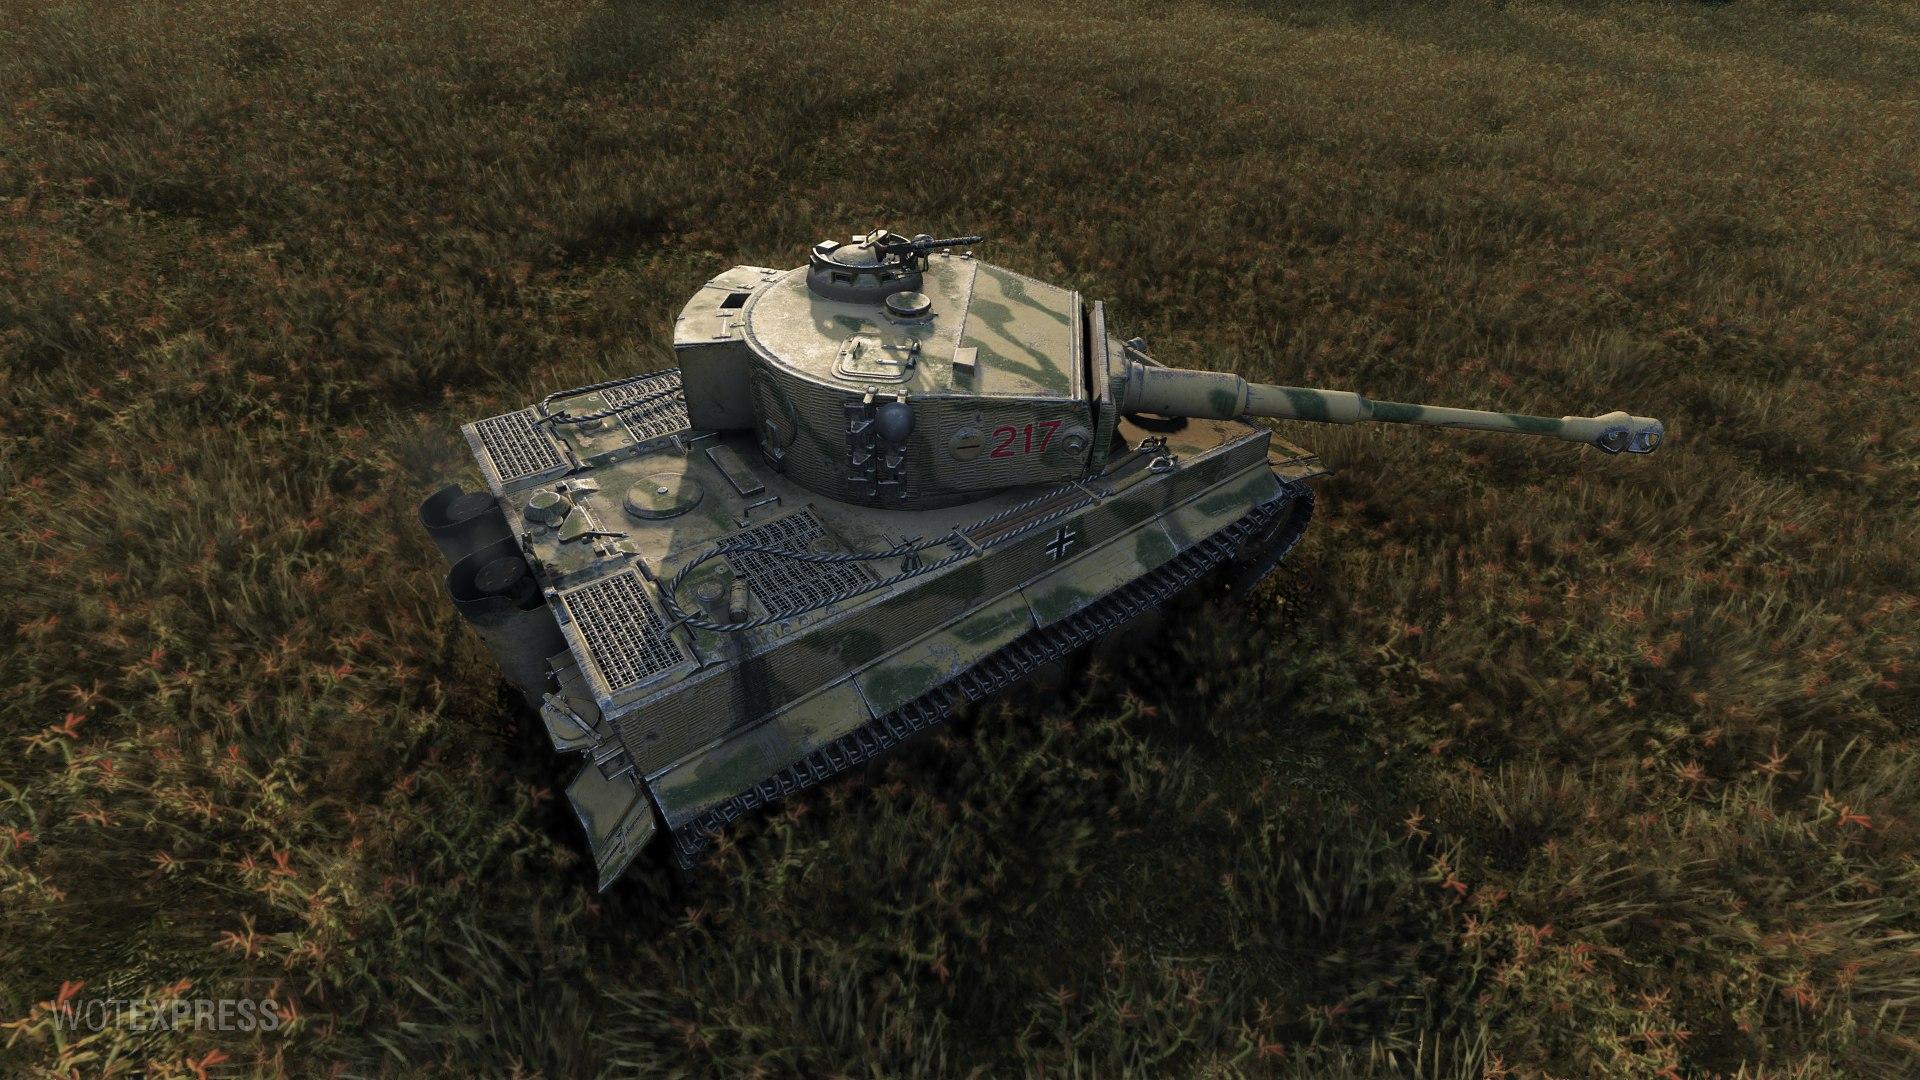 W.tiger World Of Tanks World of Tanks - Tiger...